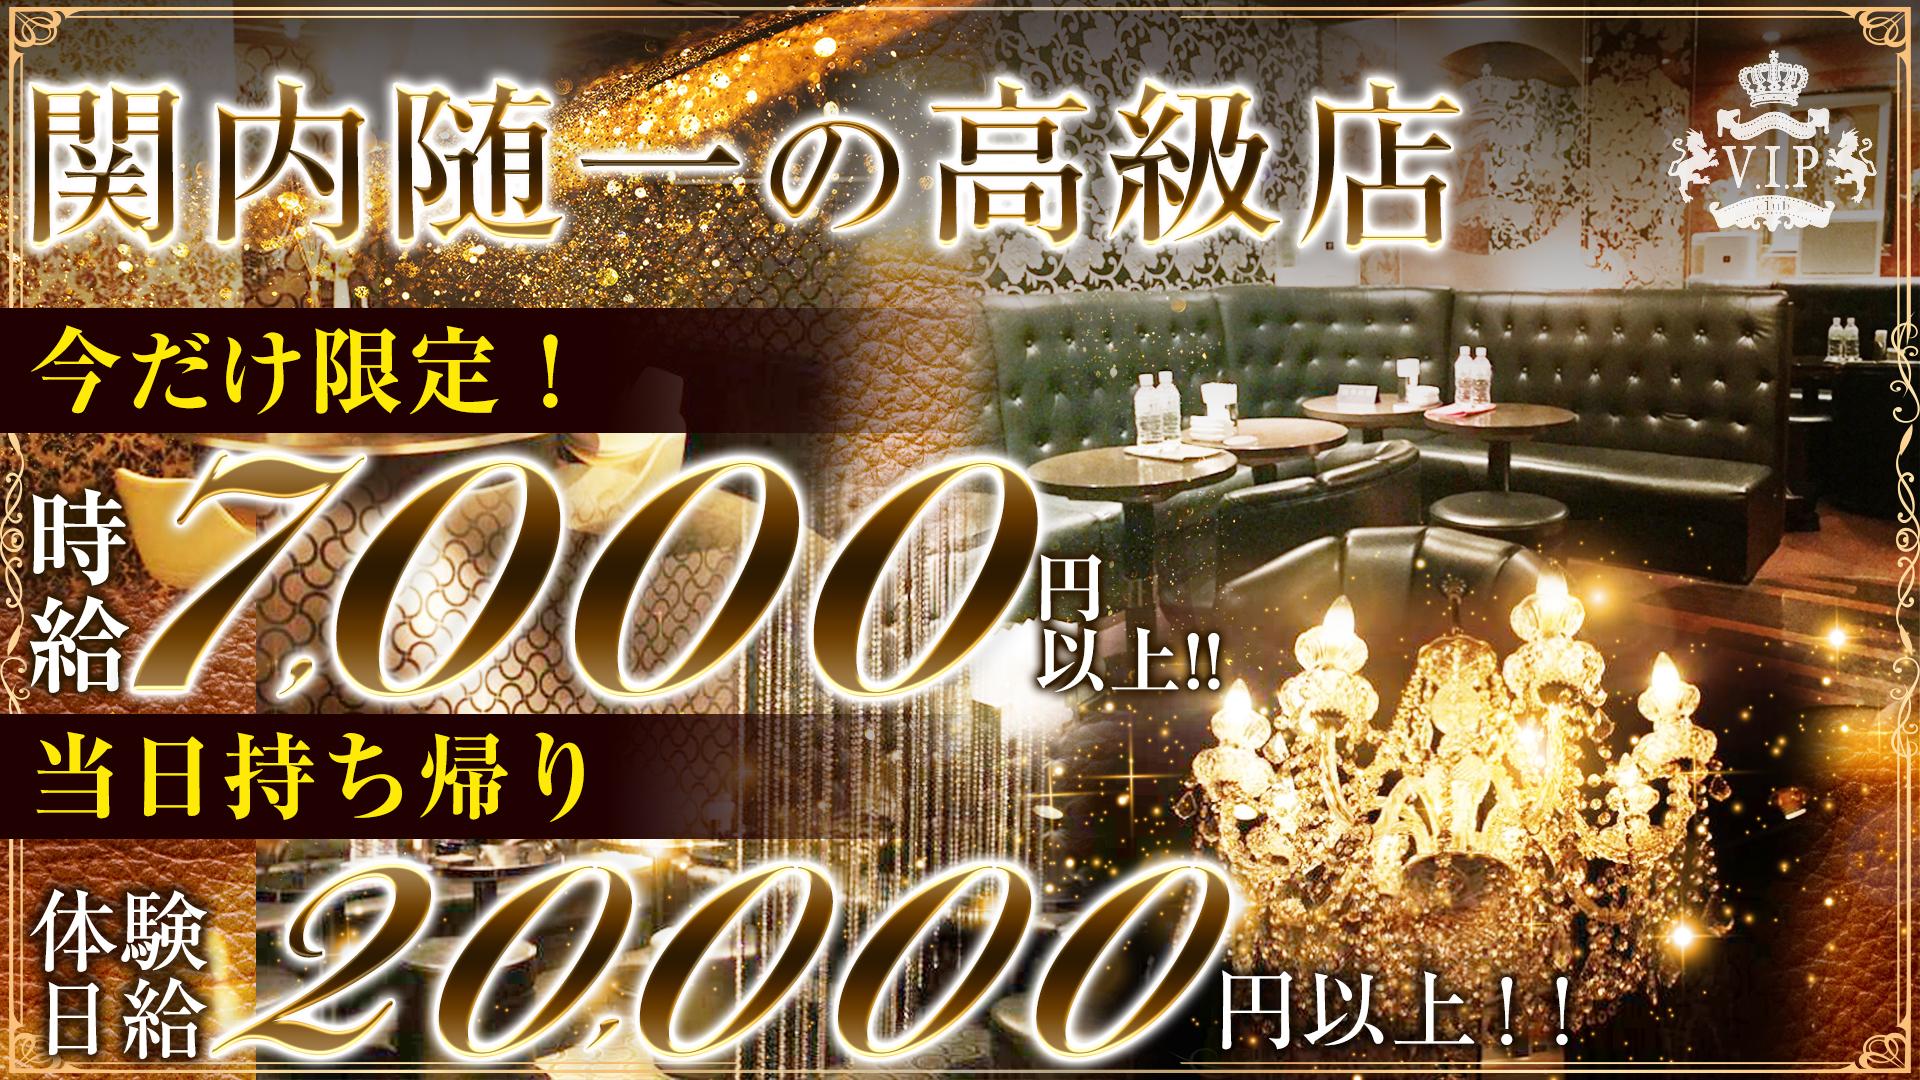 yokohama V.I.P club[ヨコハマ ブイアイピー クラブ] 関内 キャバクラ TOP画像